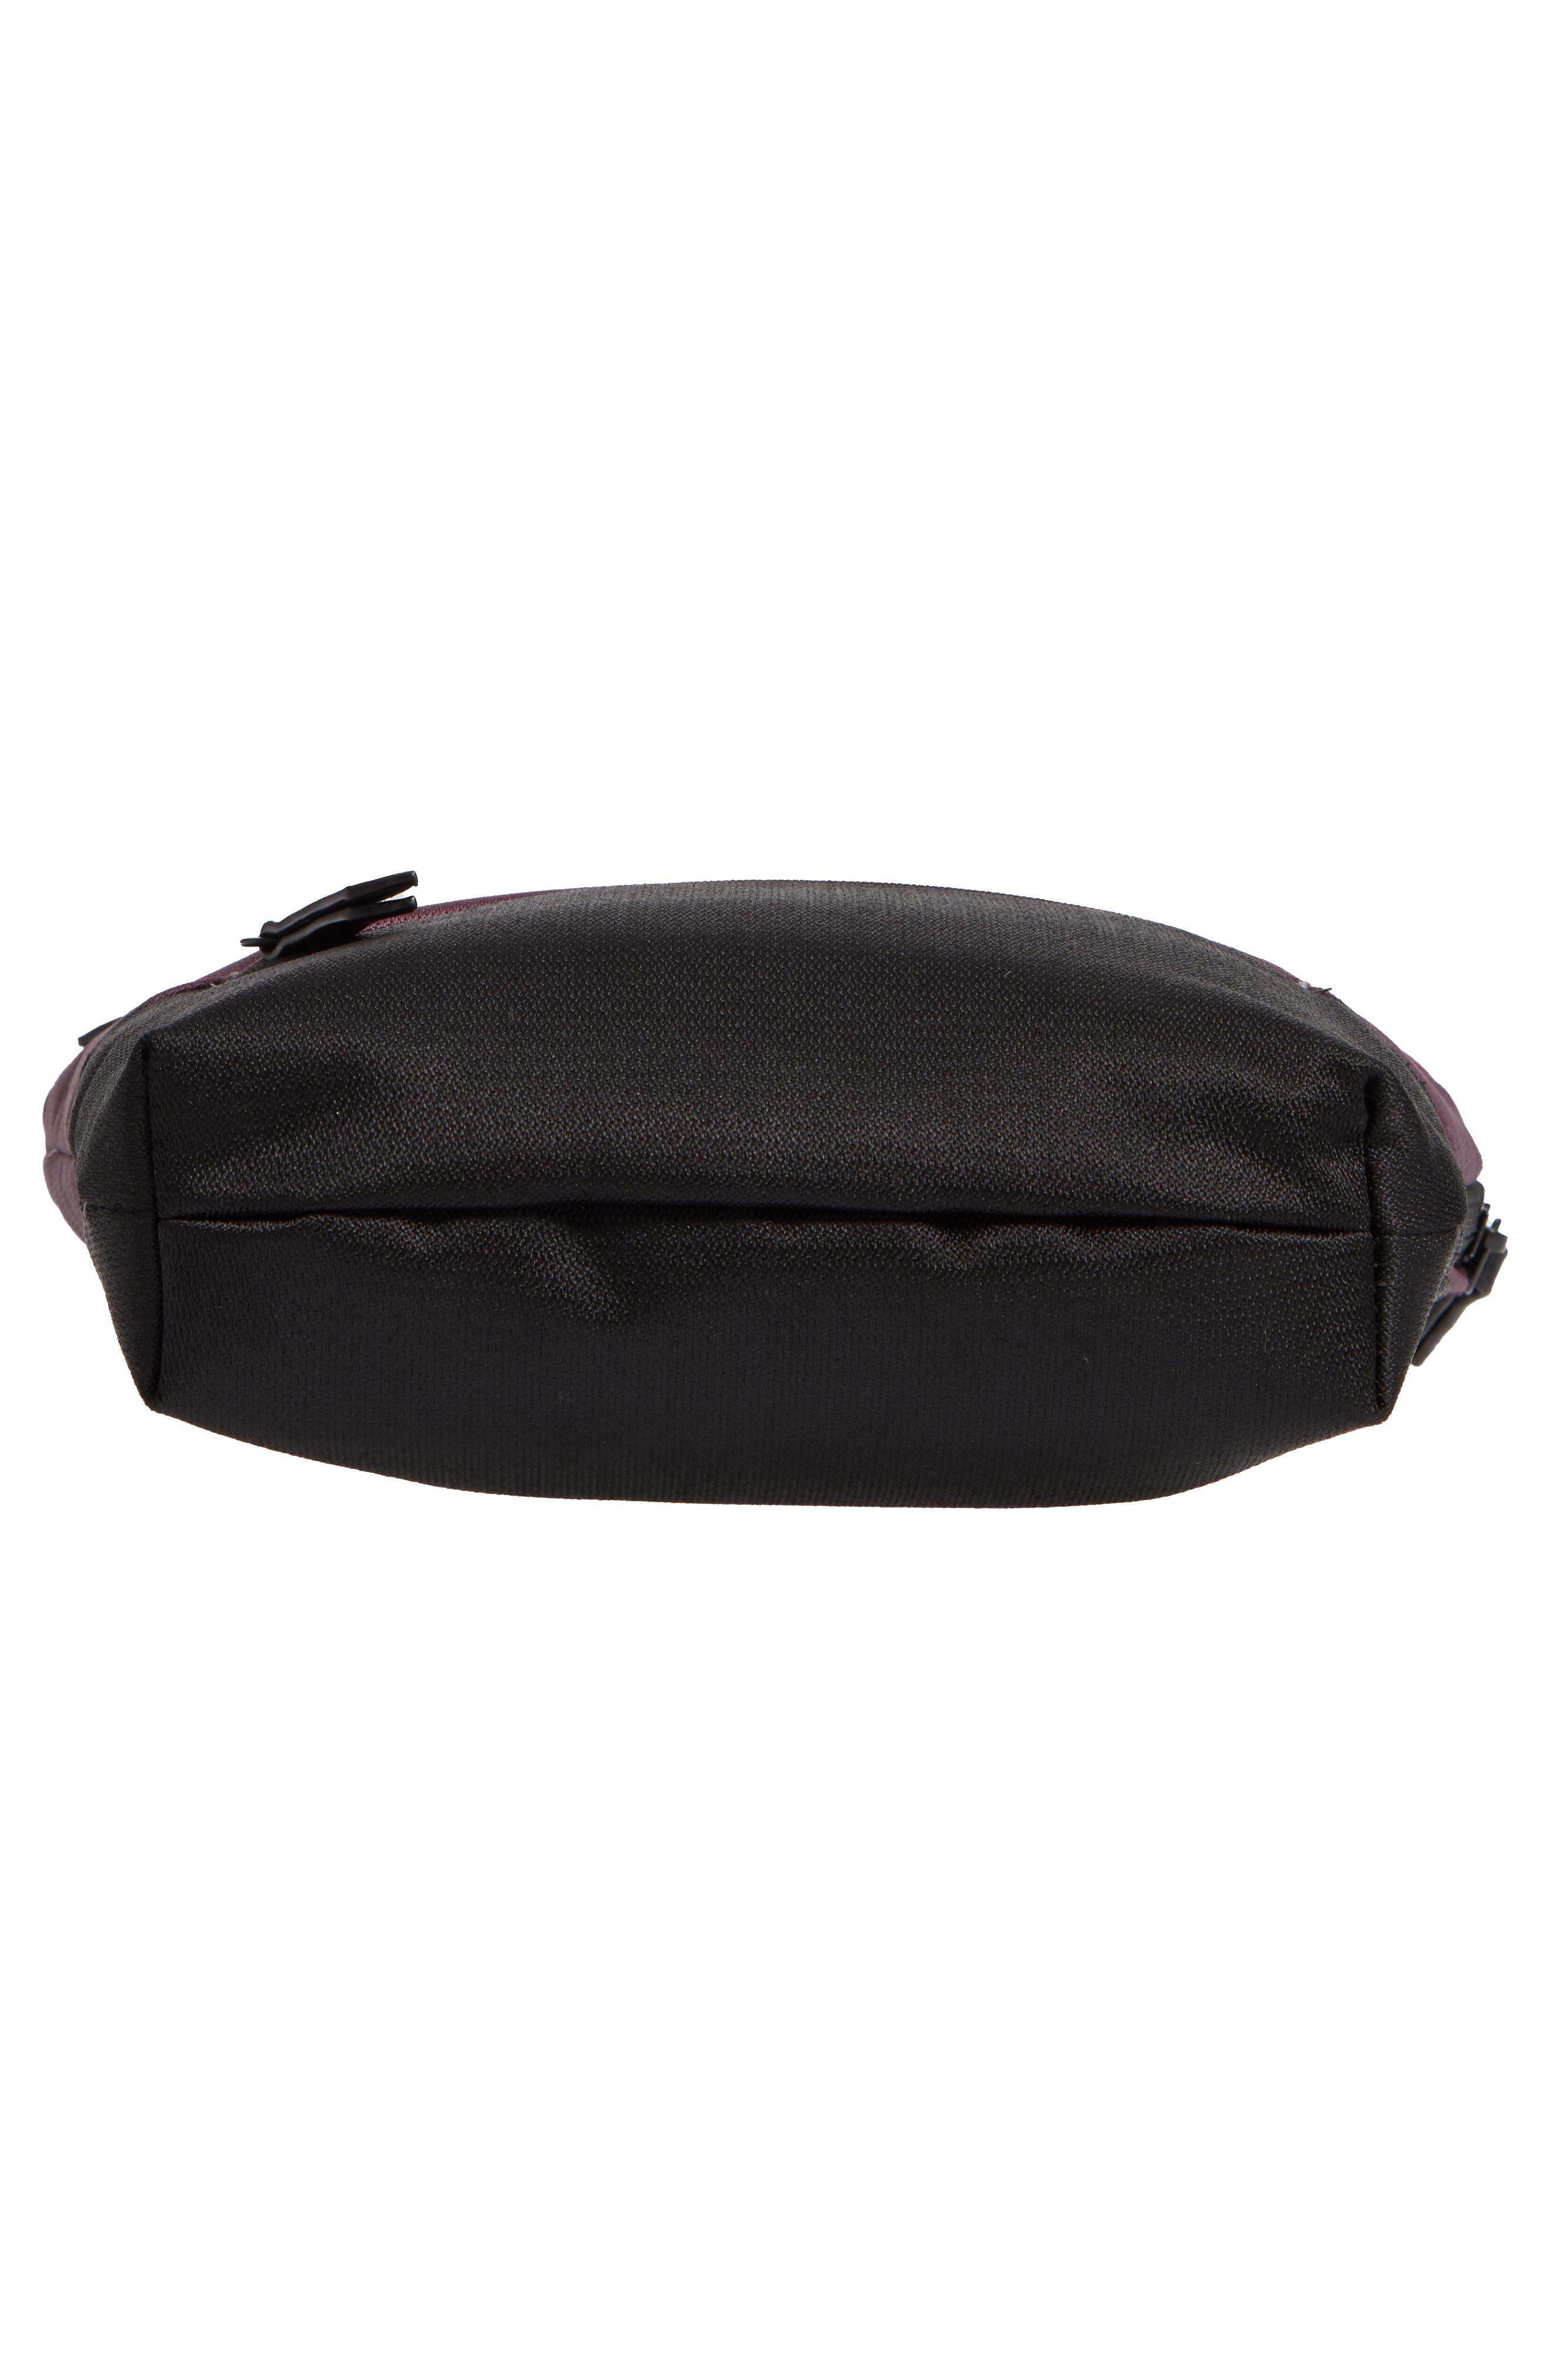 Sadie Medium RFID Crossbody Bag,                             Alternate thumbnail 6, color,                             PURPLE DAHLIA/ BLACK